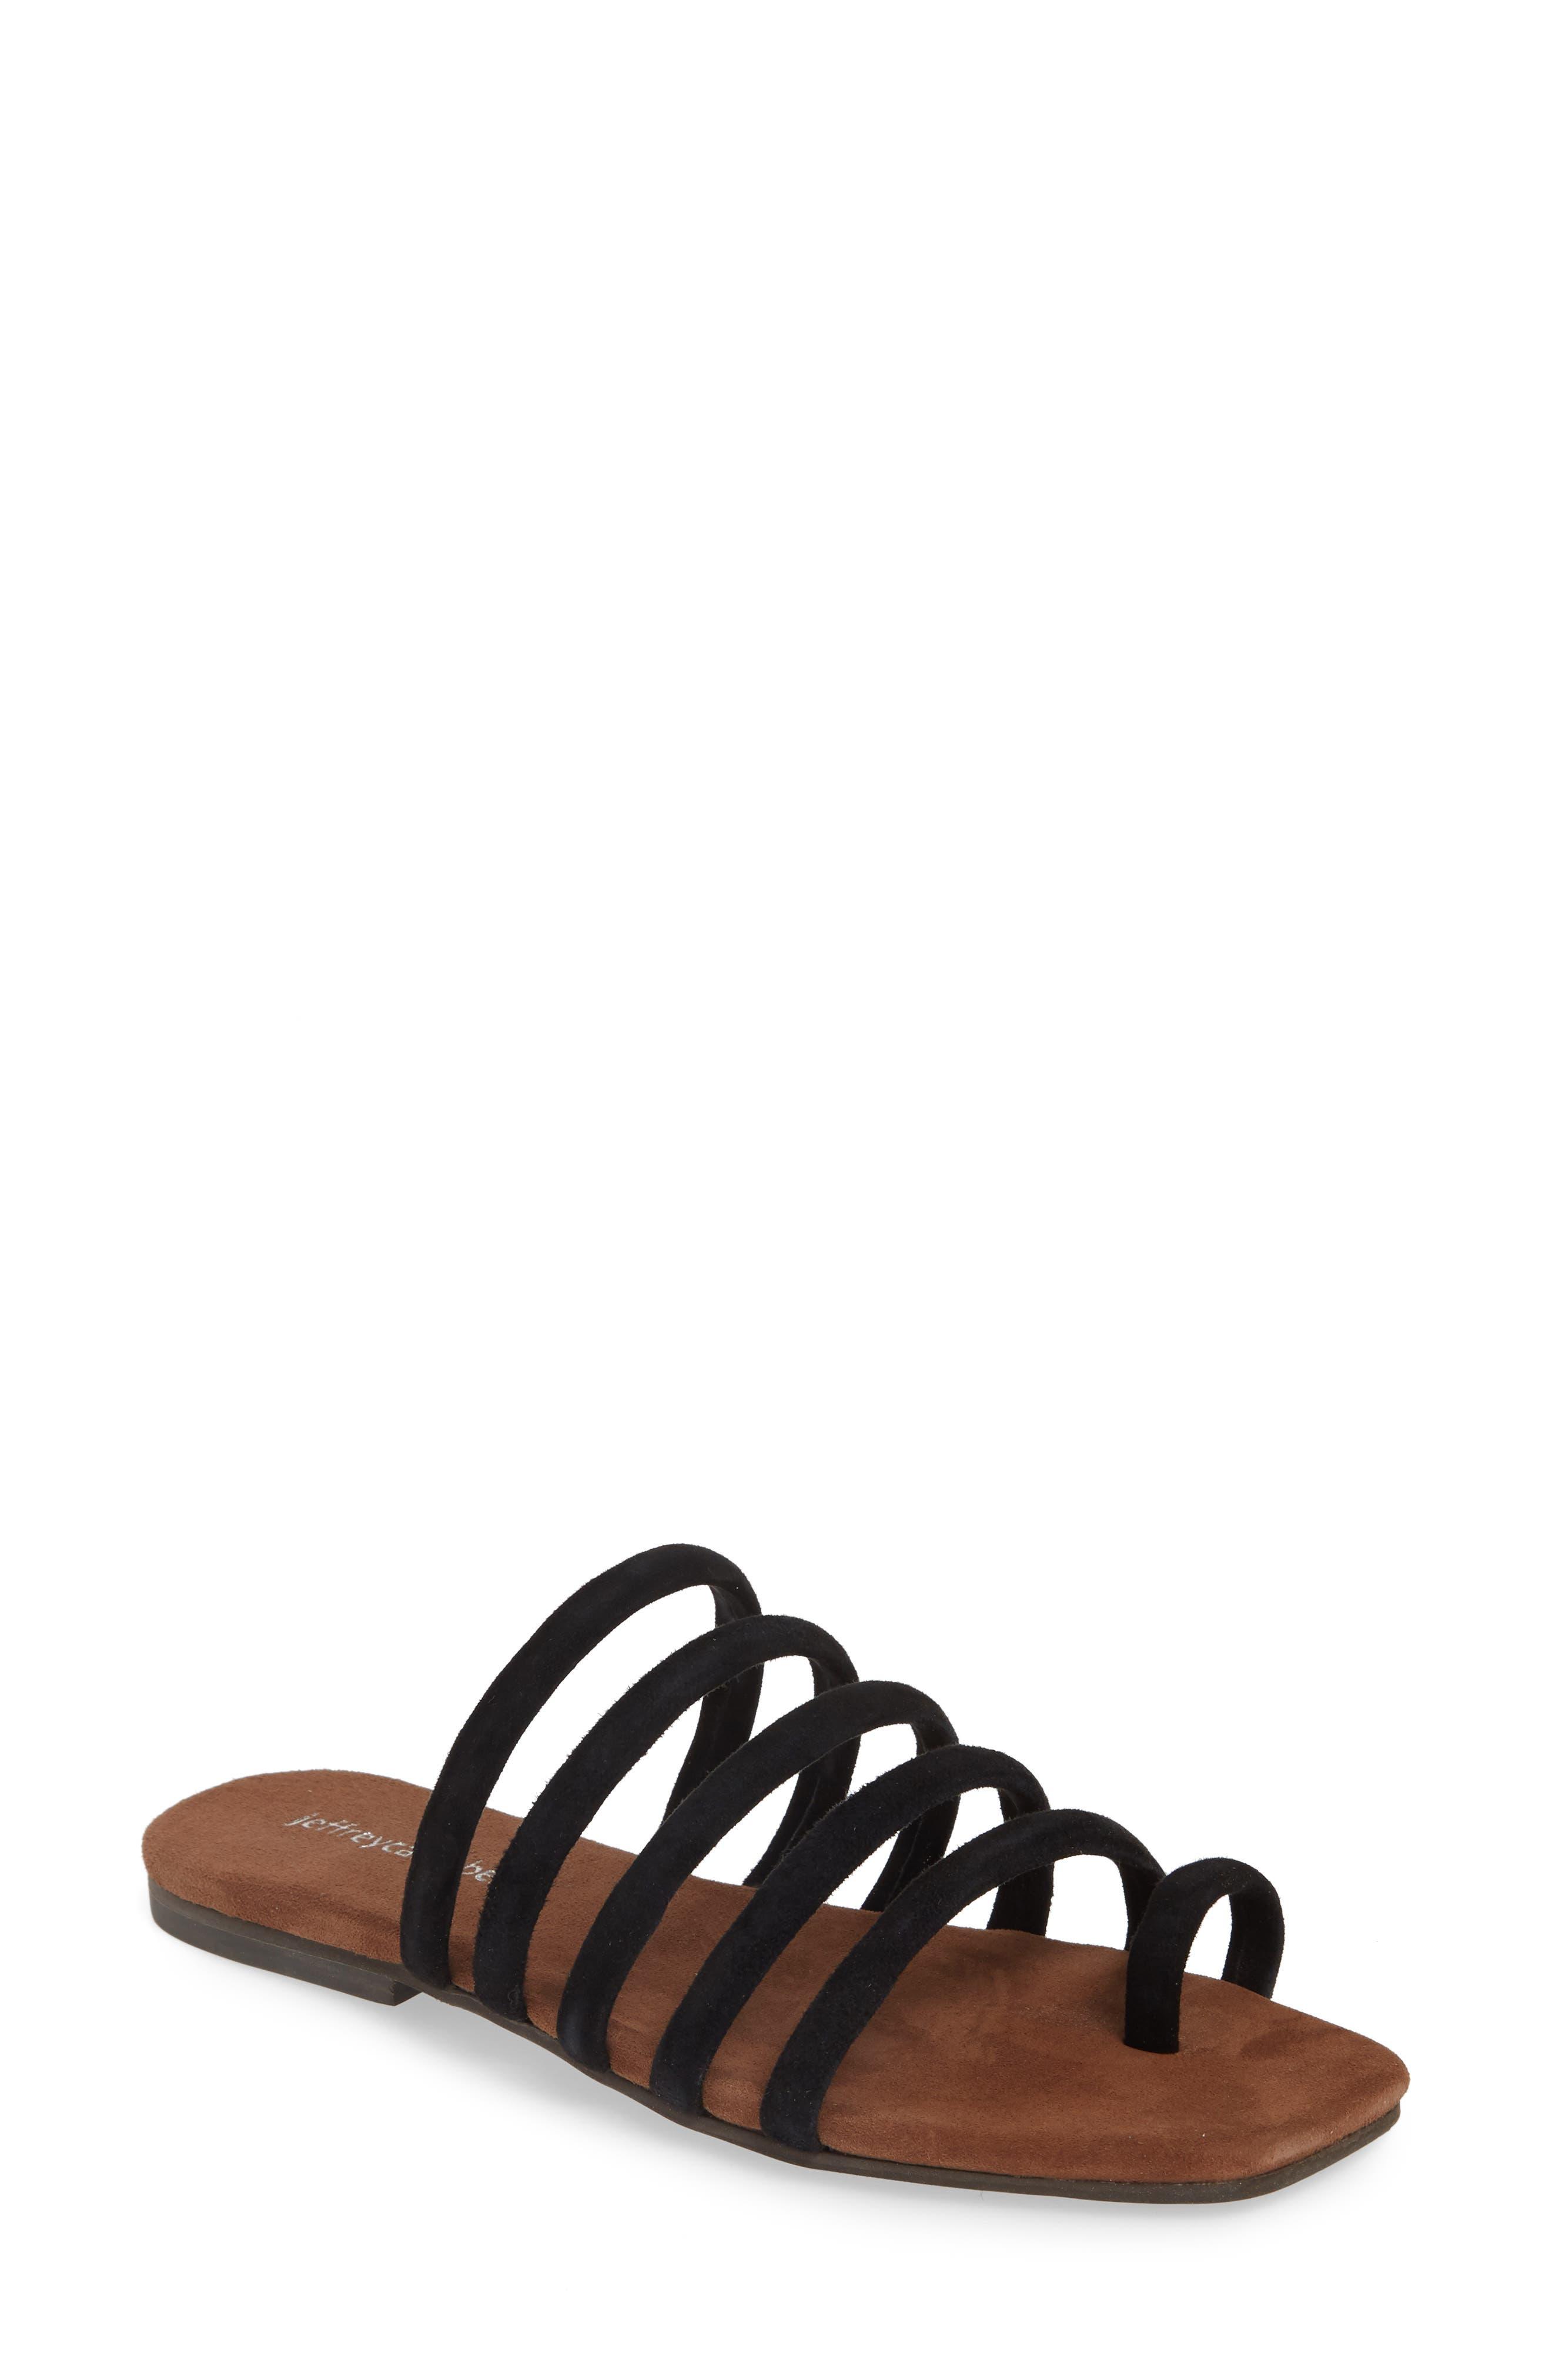 JEFFREY CAMPBELL, Coniper Slide Sandal, Main thumbnail 1, color, BLACK SUEDE